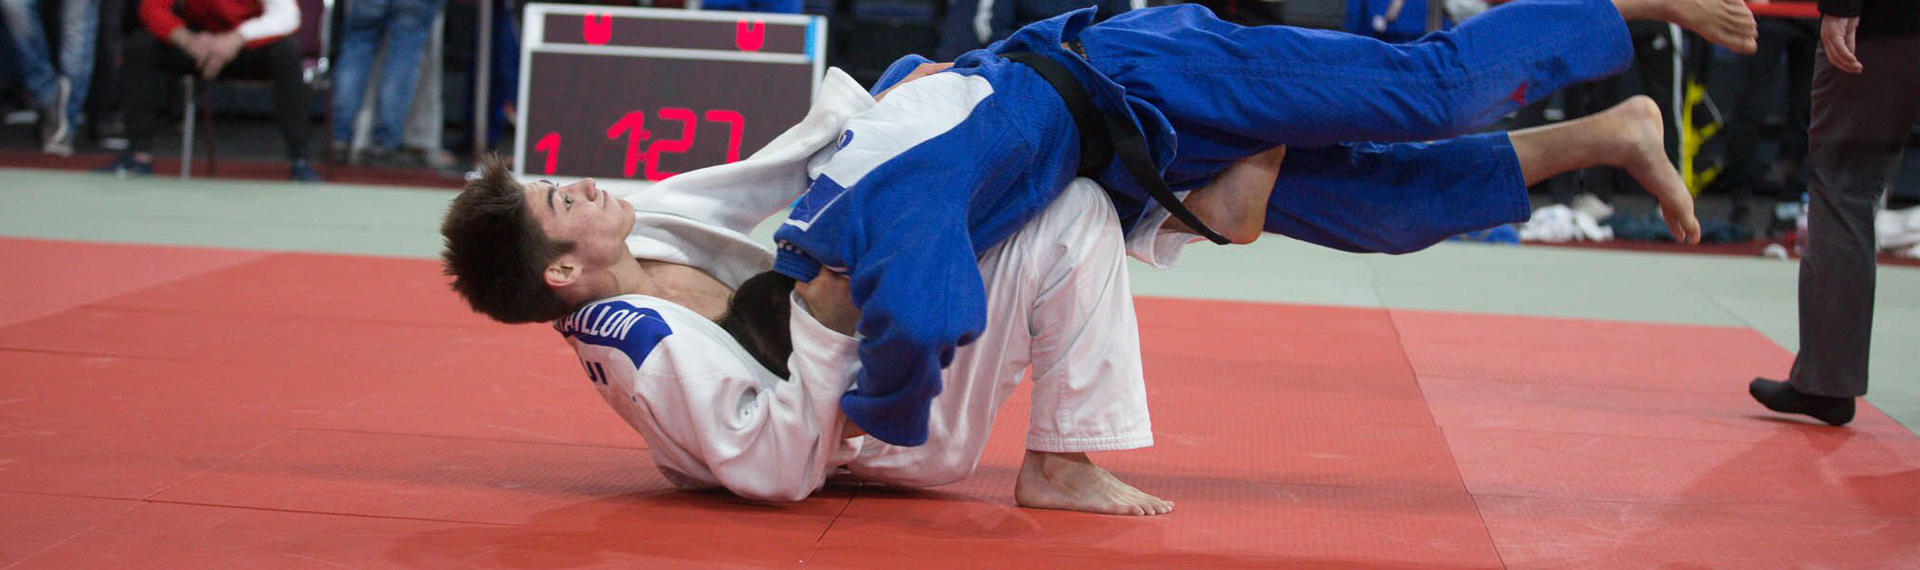 Alexis Bataillon, judo : banque privée Bonhôte